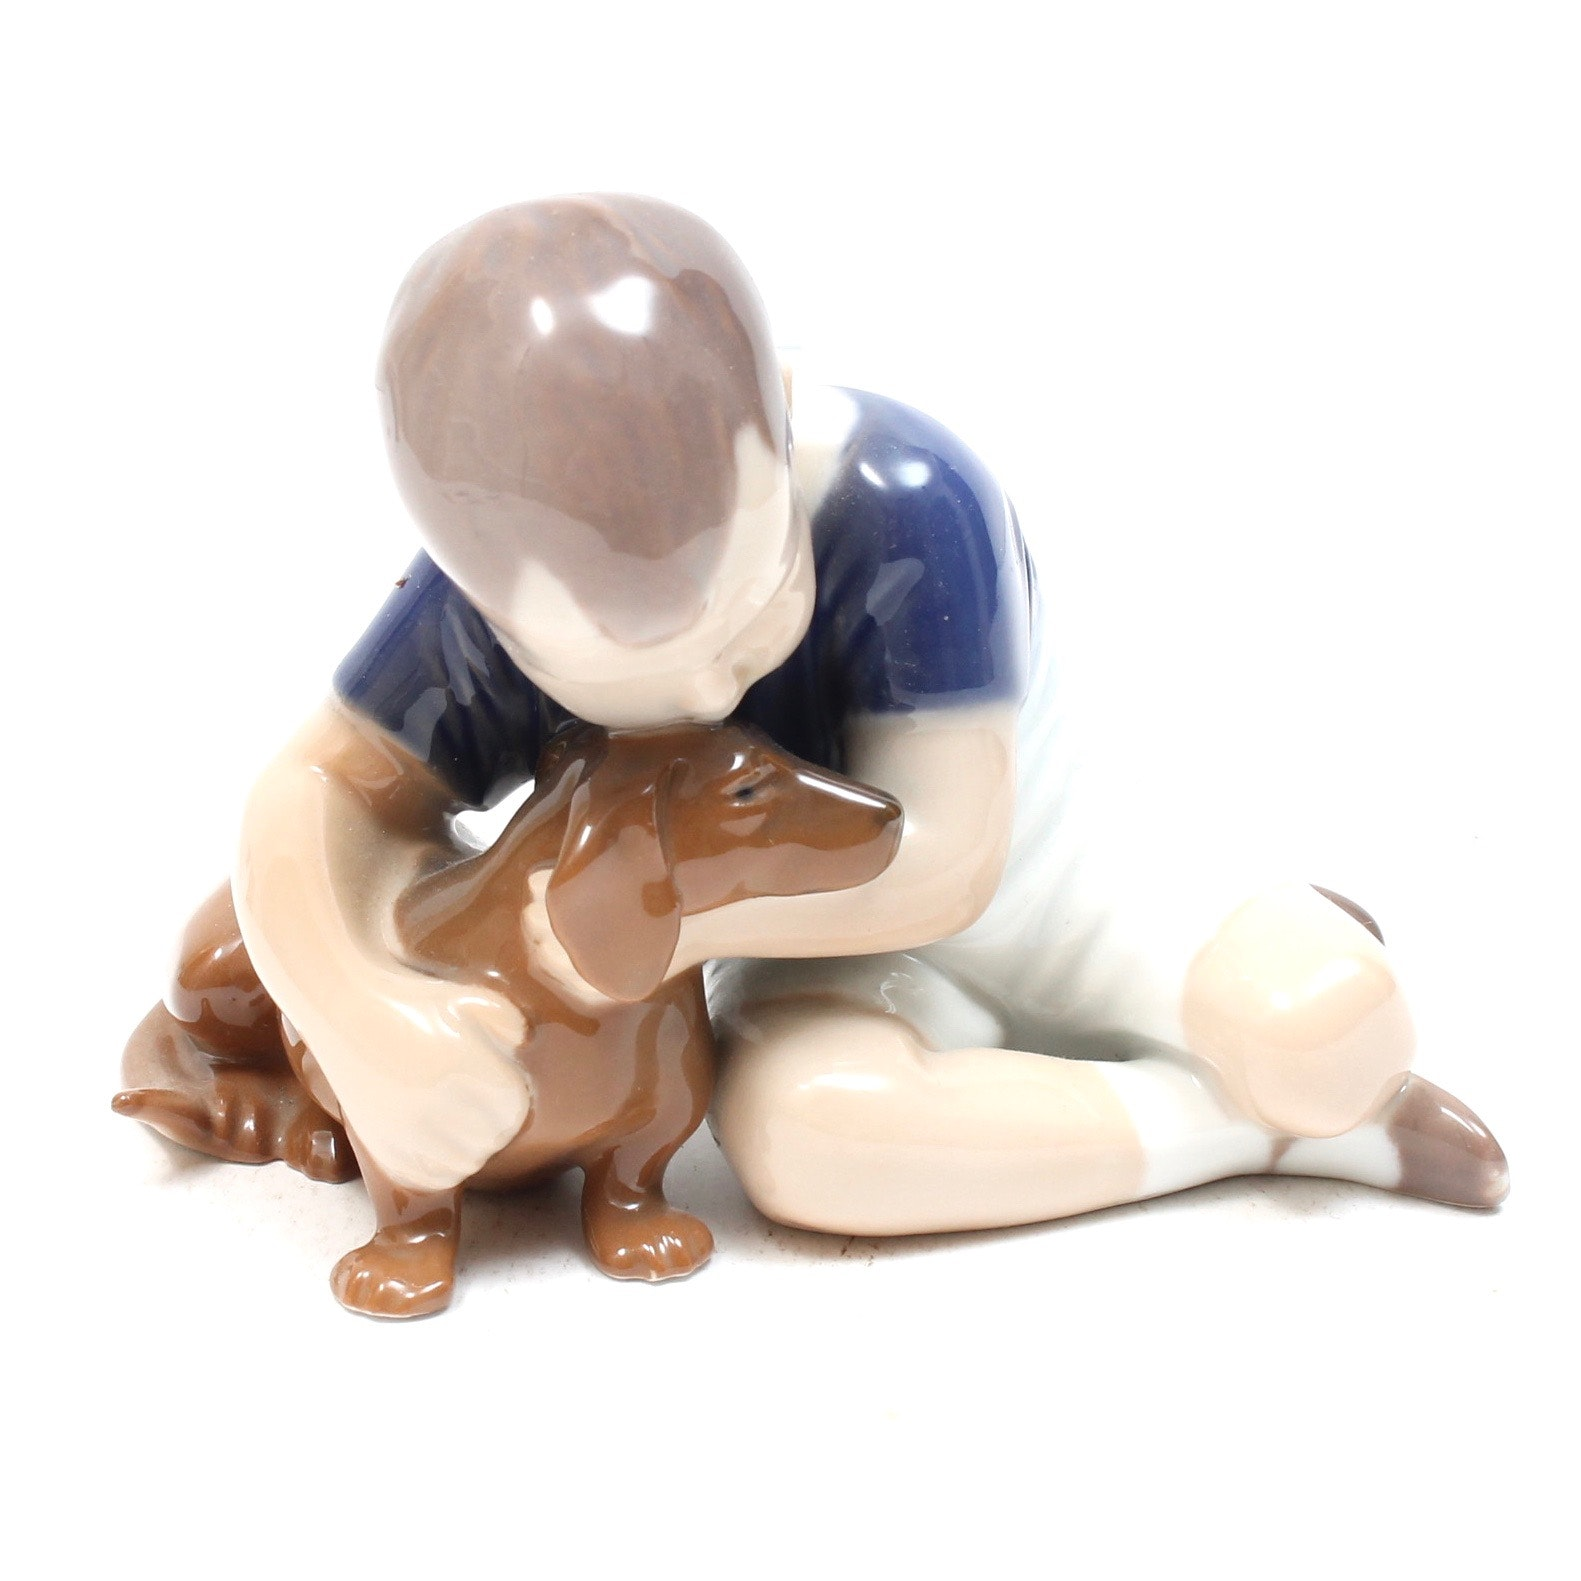 Bing & Grøndahl Boy with Dog Porcelain Figurine